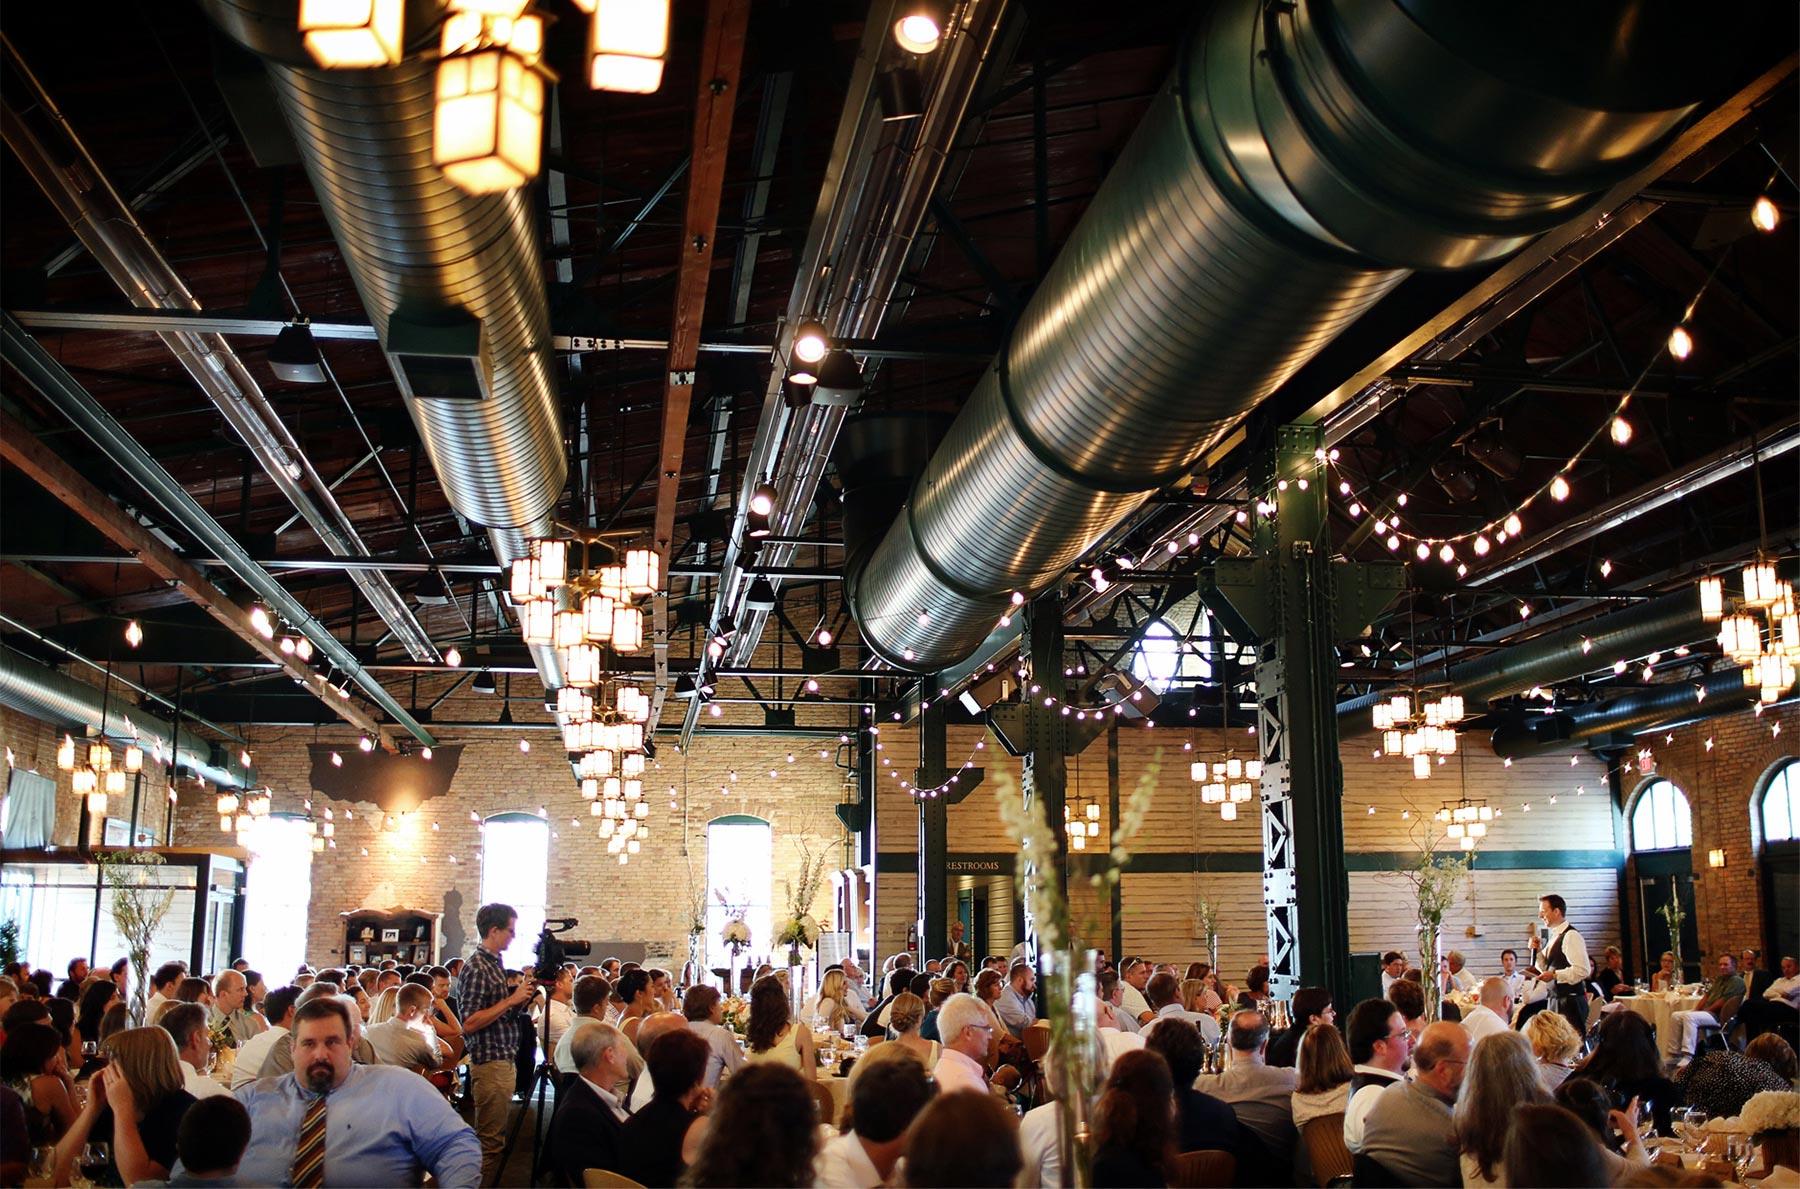 21-Minneapolis-Minnesota-Wedding-Photography-by-Vick-Photography-Downtown-Reception-Nicollet-Island-Pavillion-Sarah-&-Tom.jpg